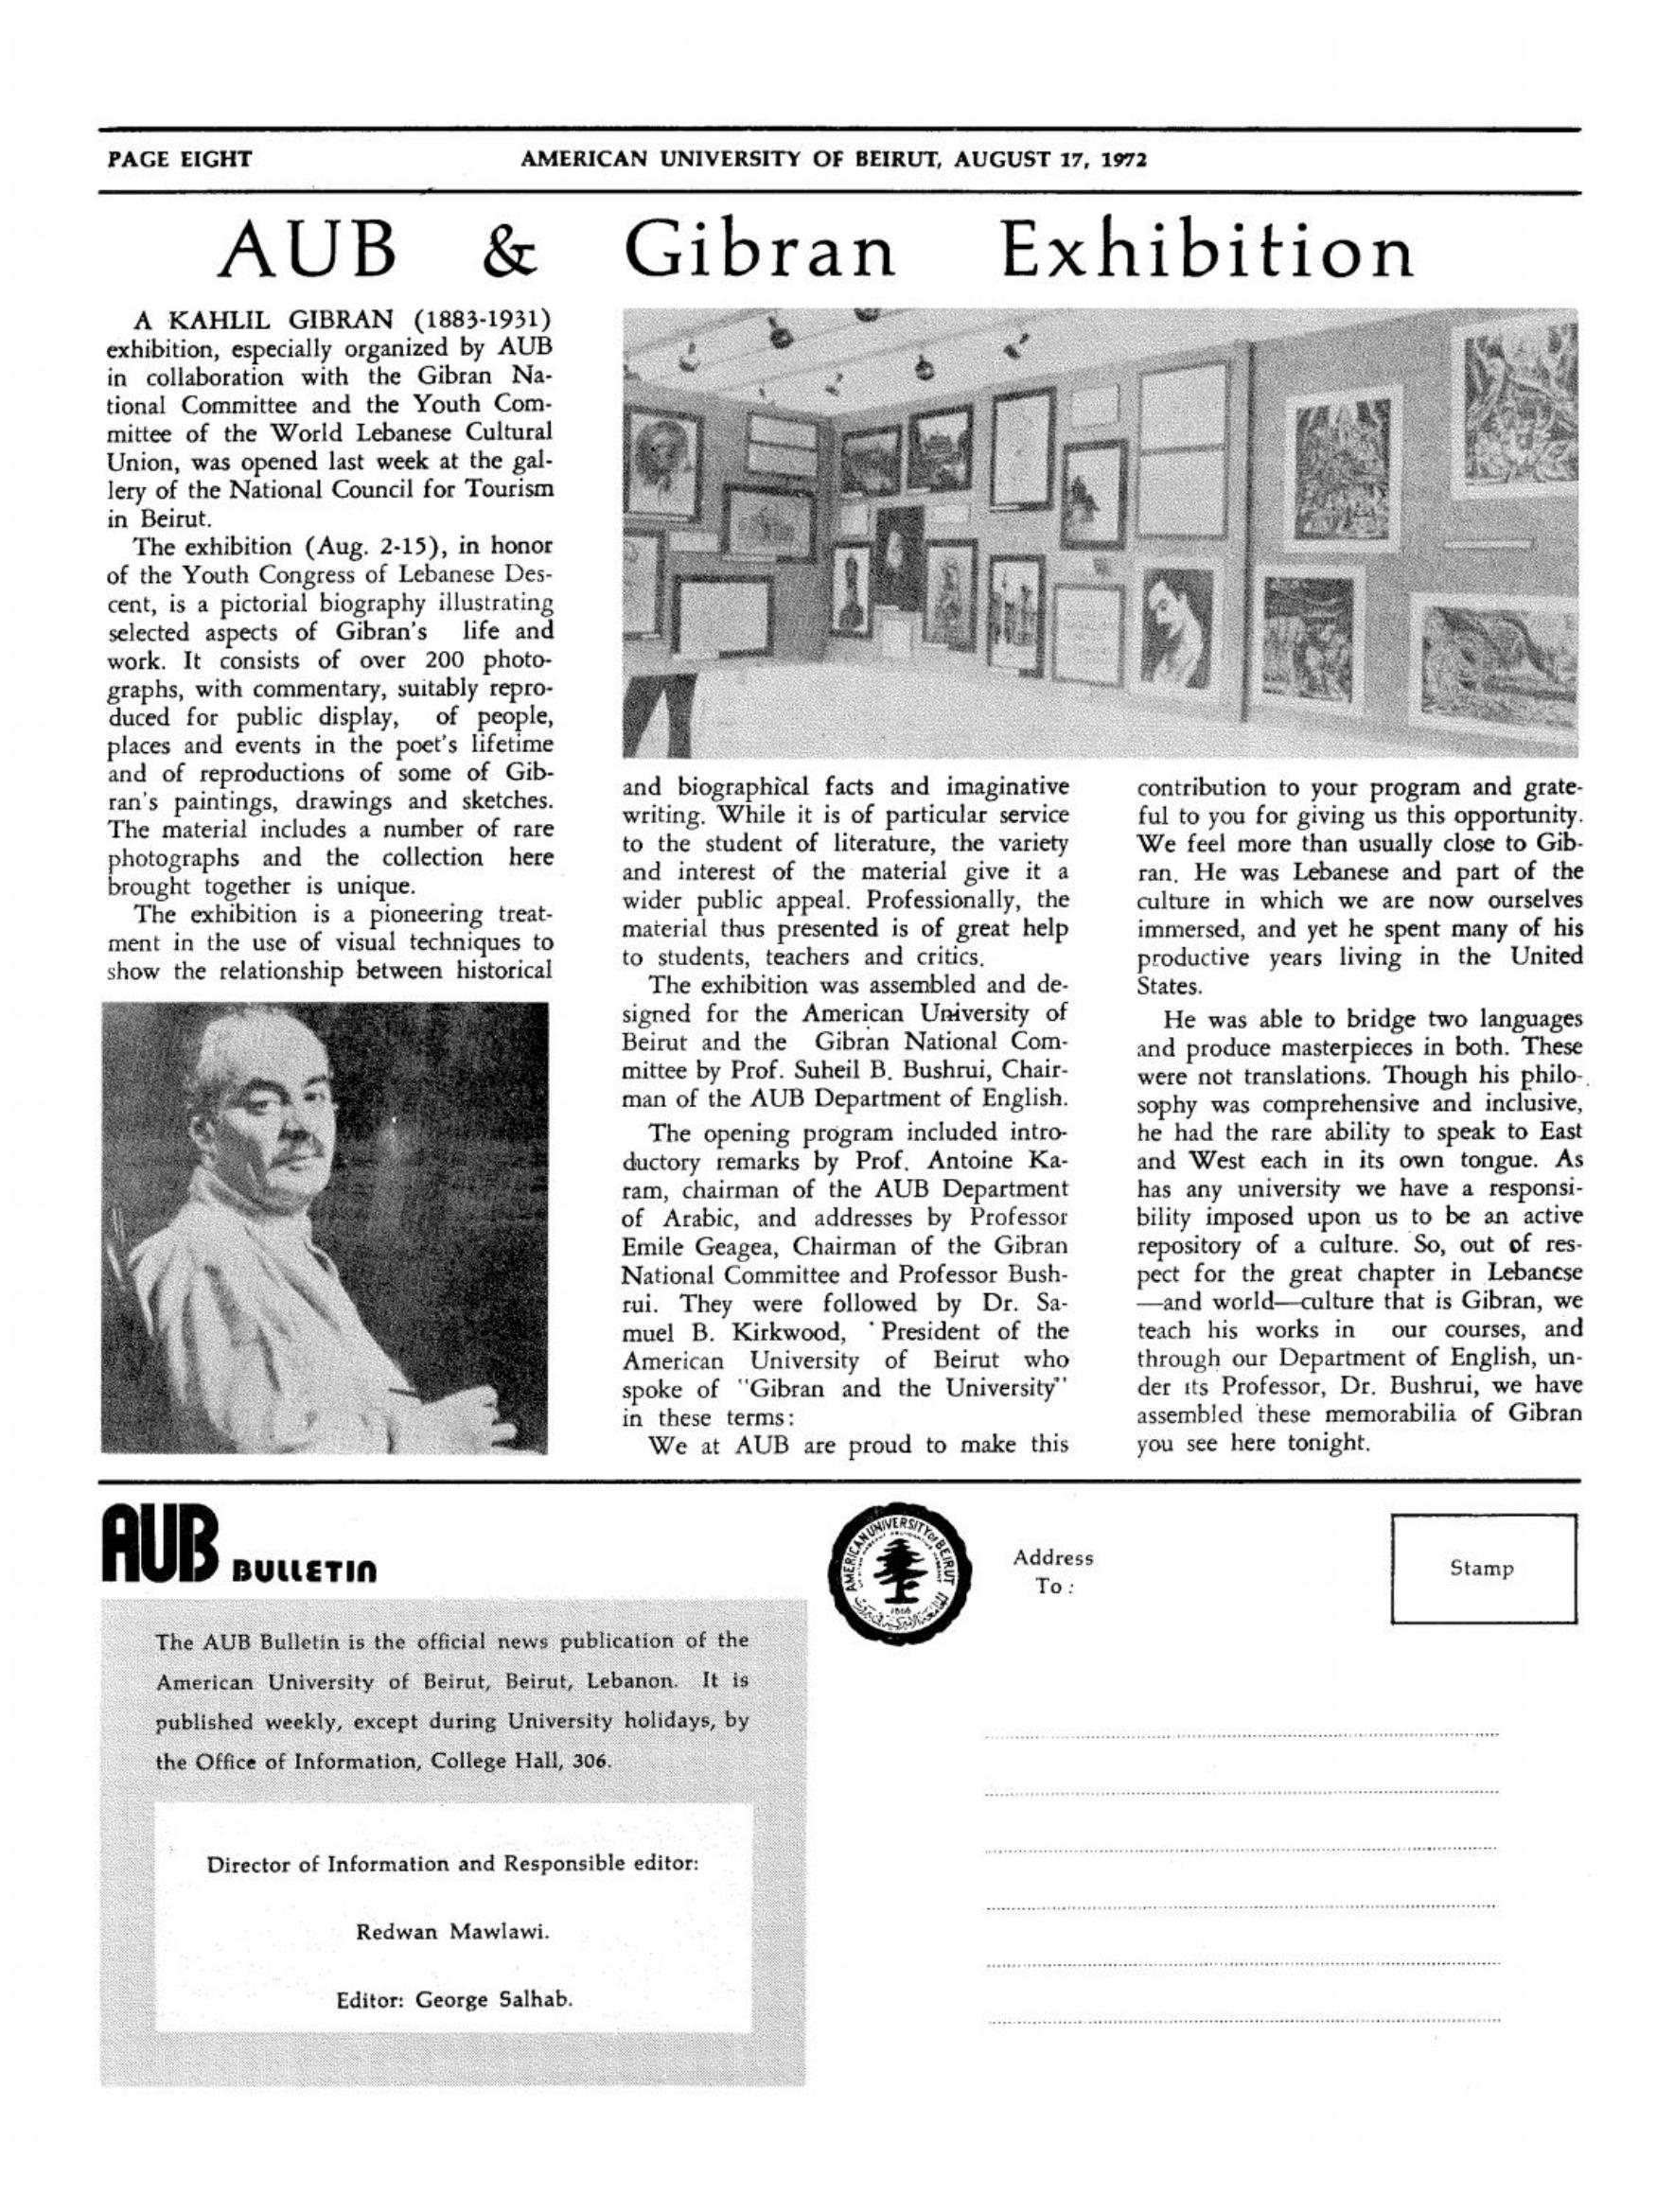 """AUB & Gibran Exhibition"", American University of Beirut, Aug 17, 1972, p. 8."